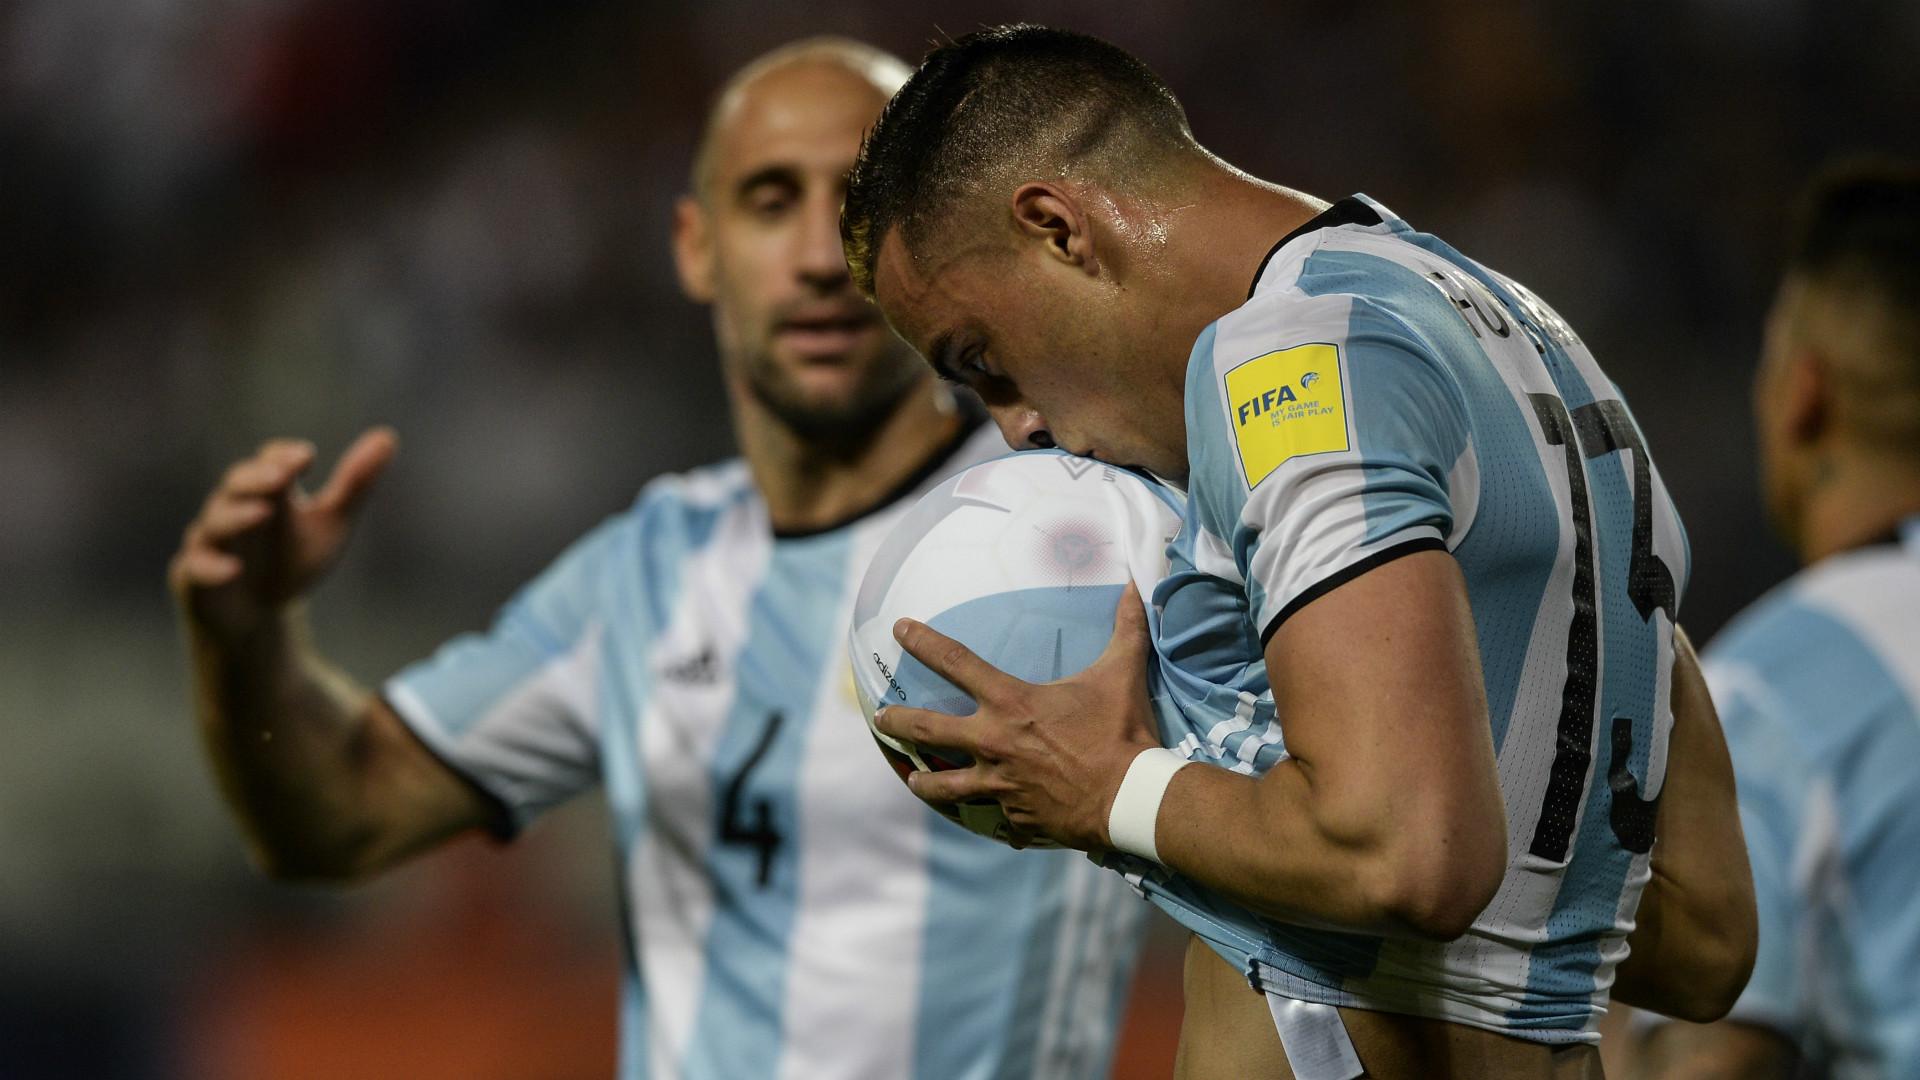 Brazil vs Argentina: 'Champion' Brazil bring back joy to Mineirao